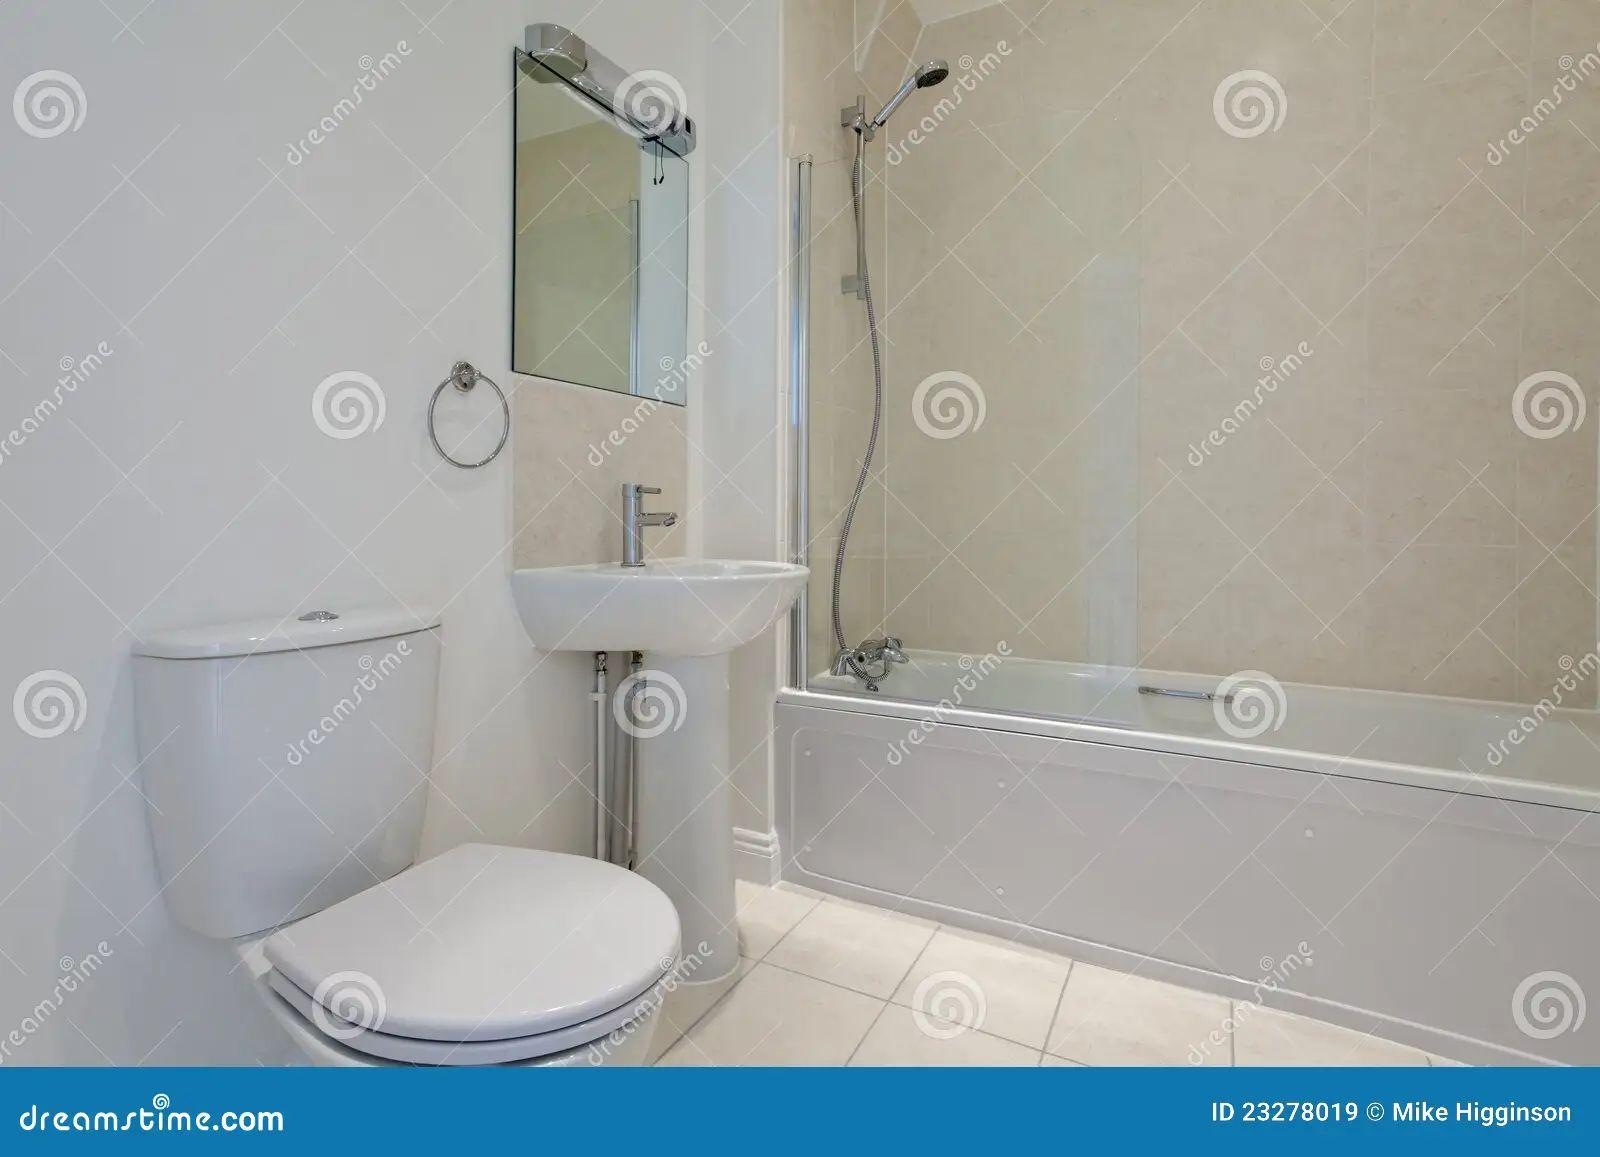 Basic basin bath bathroom hand shower suite